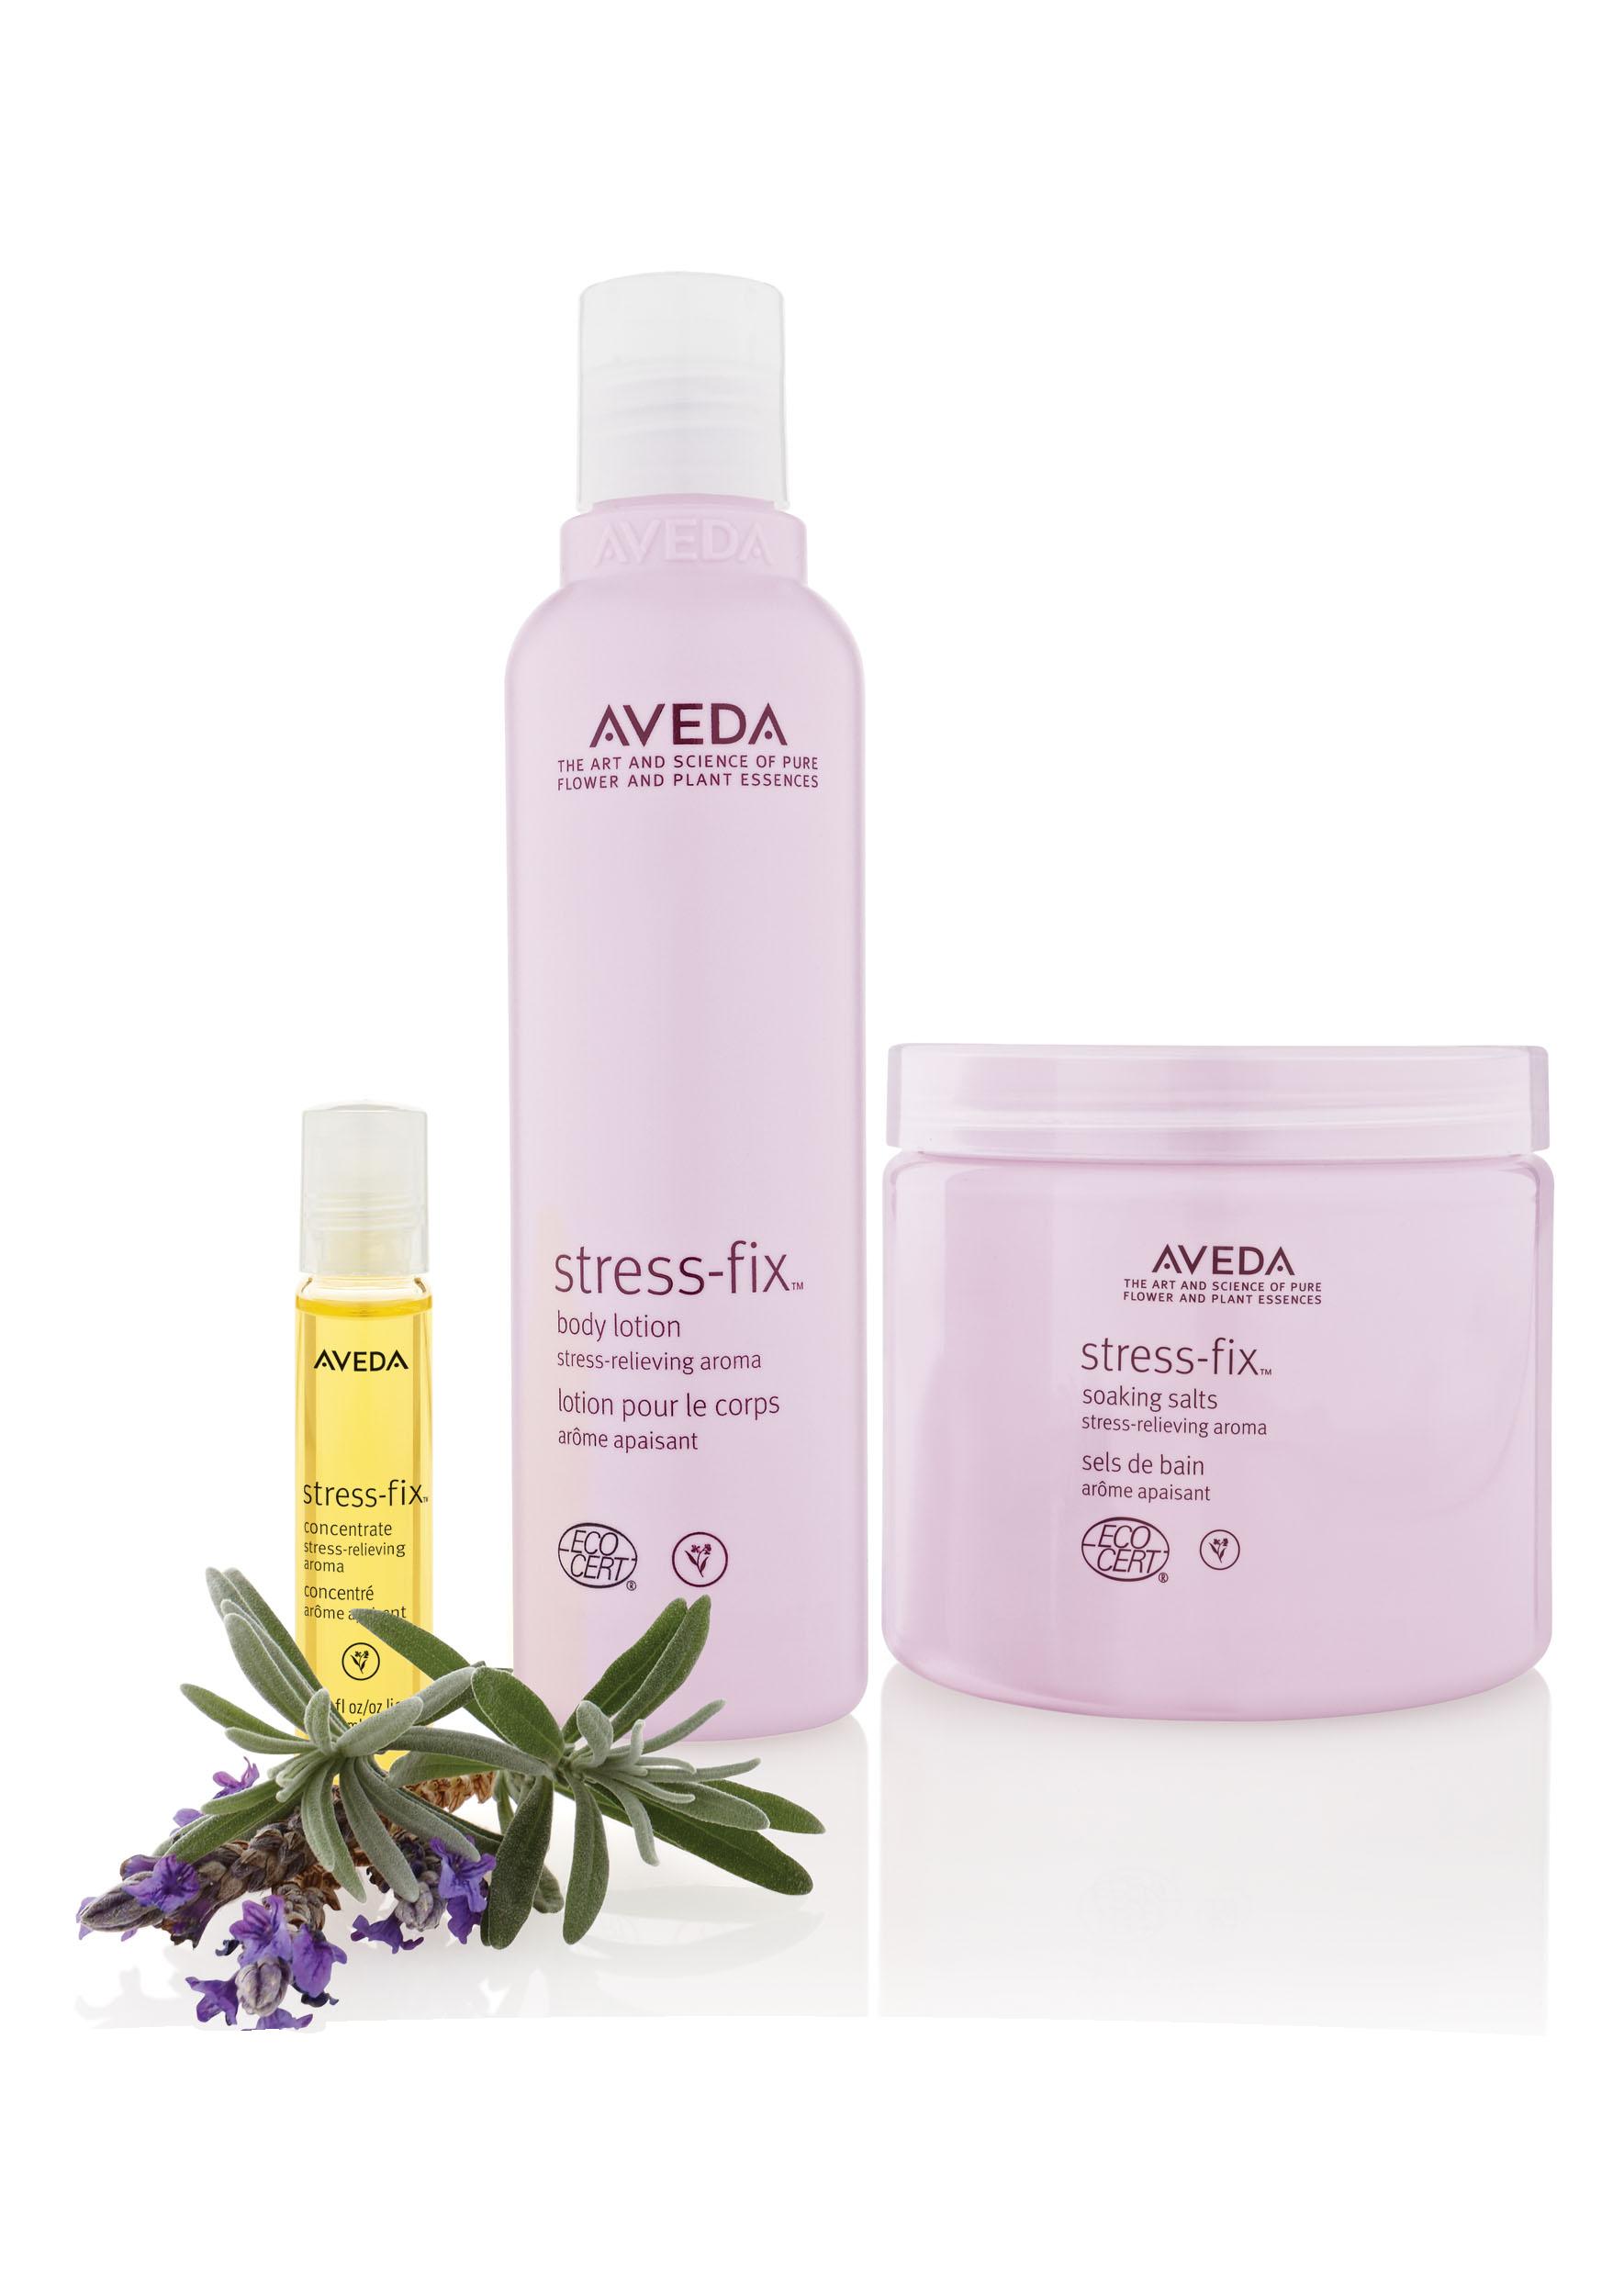 Aveda stress-fix™ @ IINN Sustainable Beauty